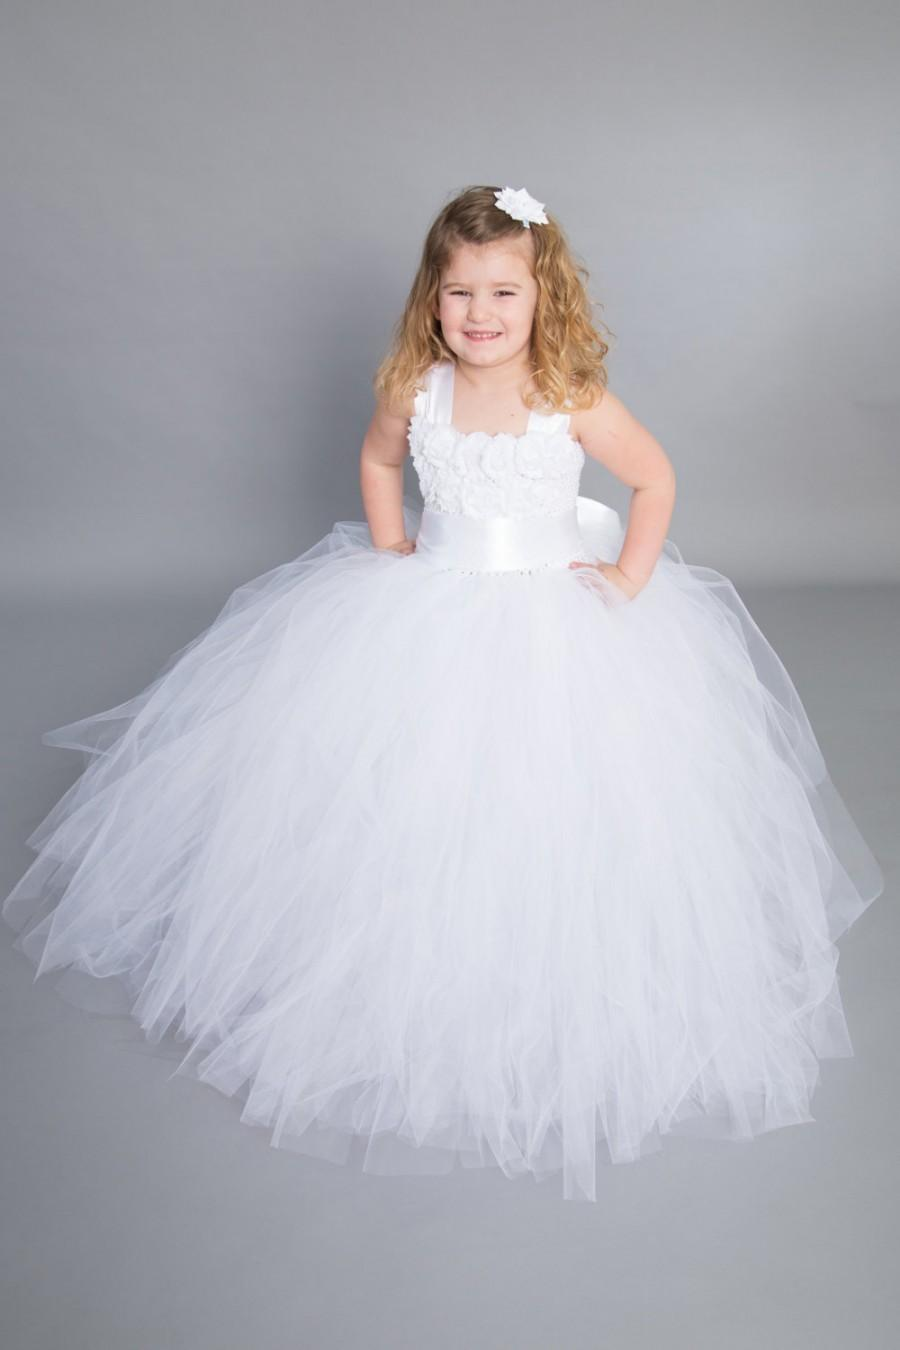 Mariage - Flower girl dress - tulle flower girl dress- First Communion -Infant/Toddler - Pageant dress - wedding - Princess dress -White flower dress